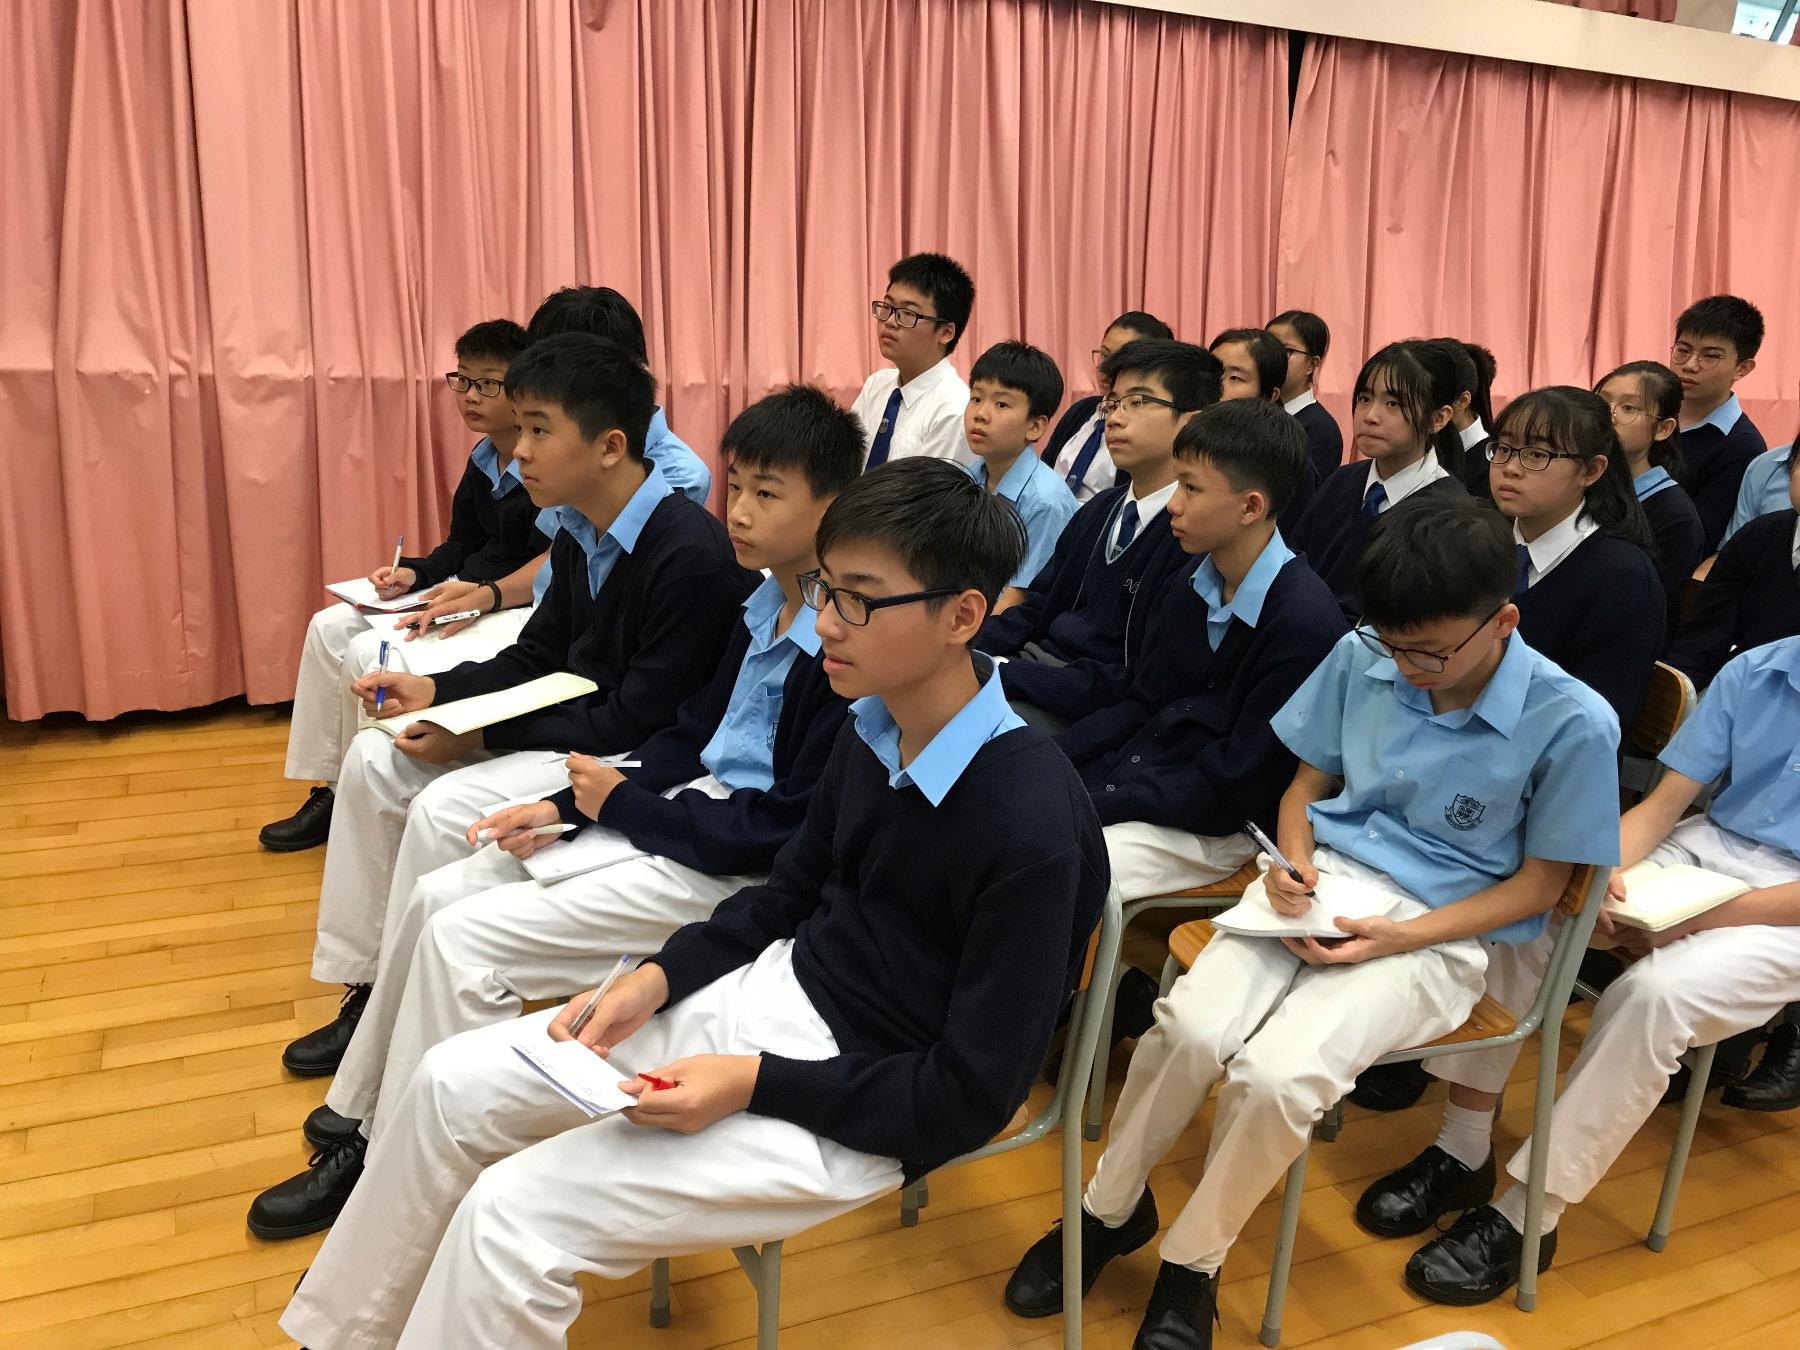 http://npc.edu.hk/sites/default/files/img_0673.jpg